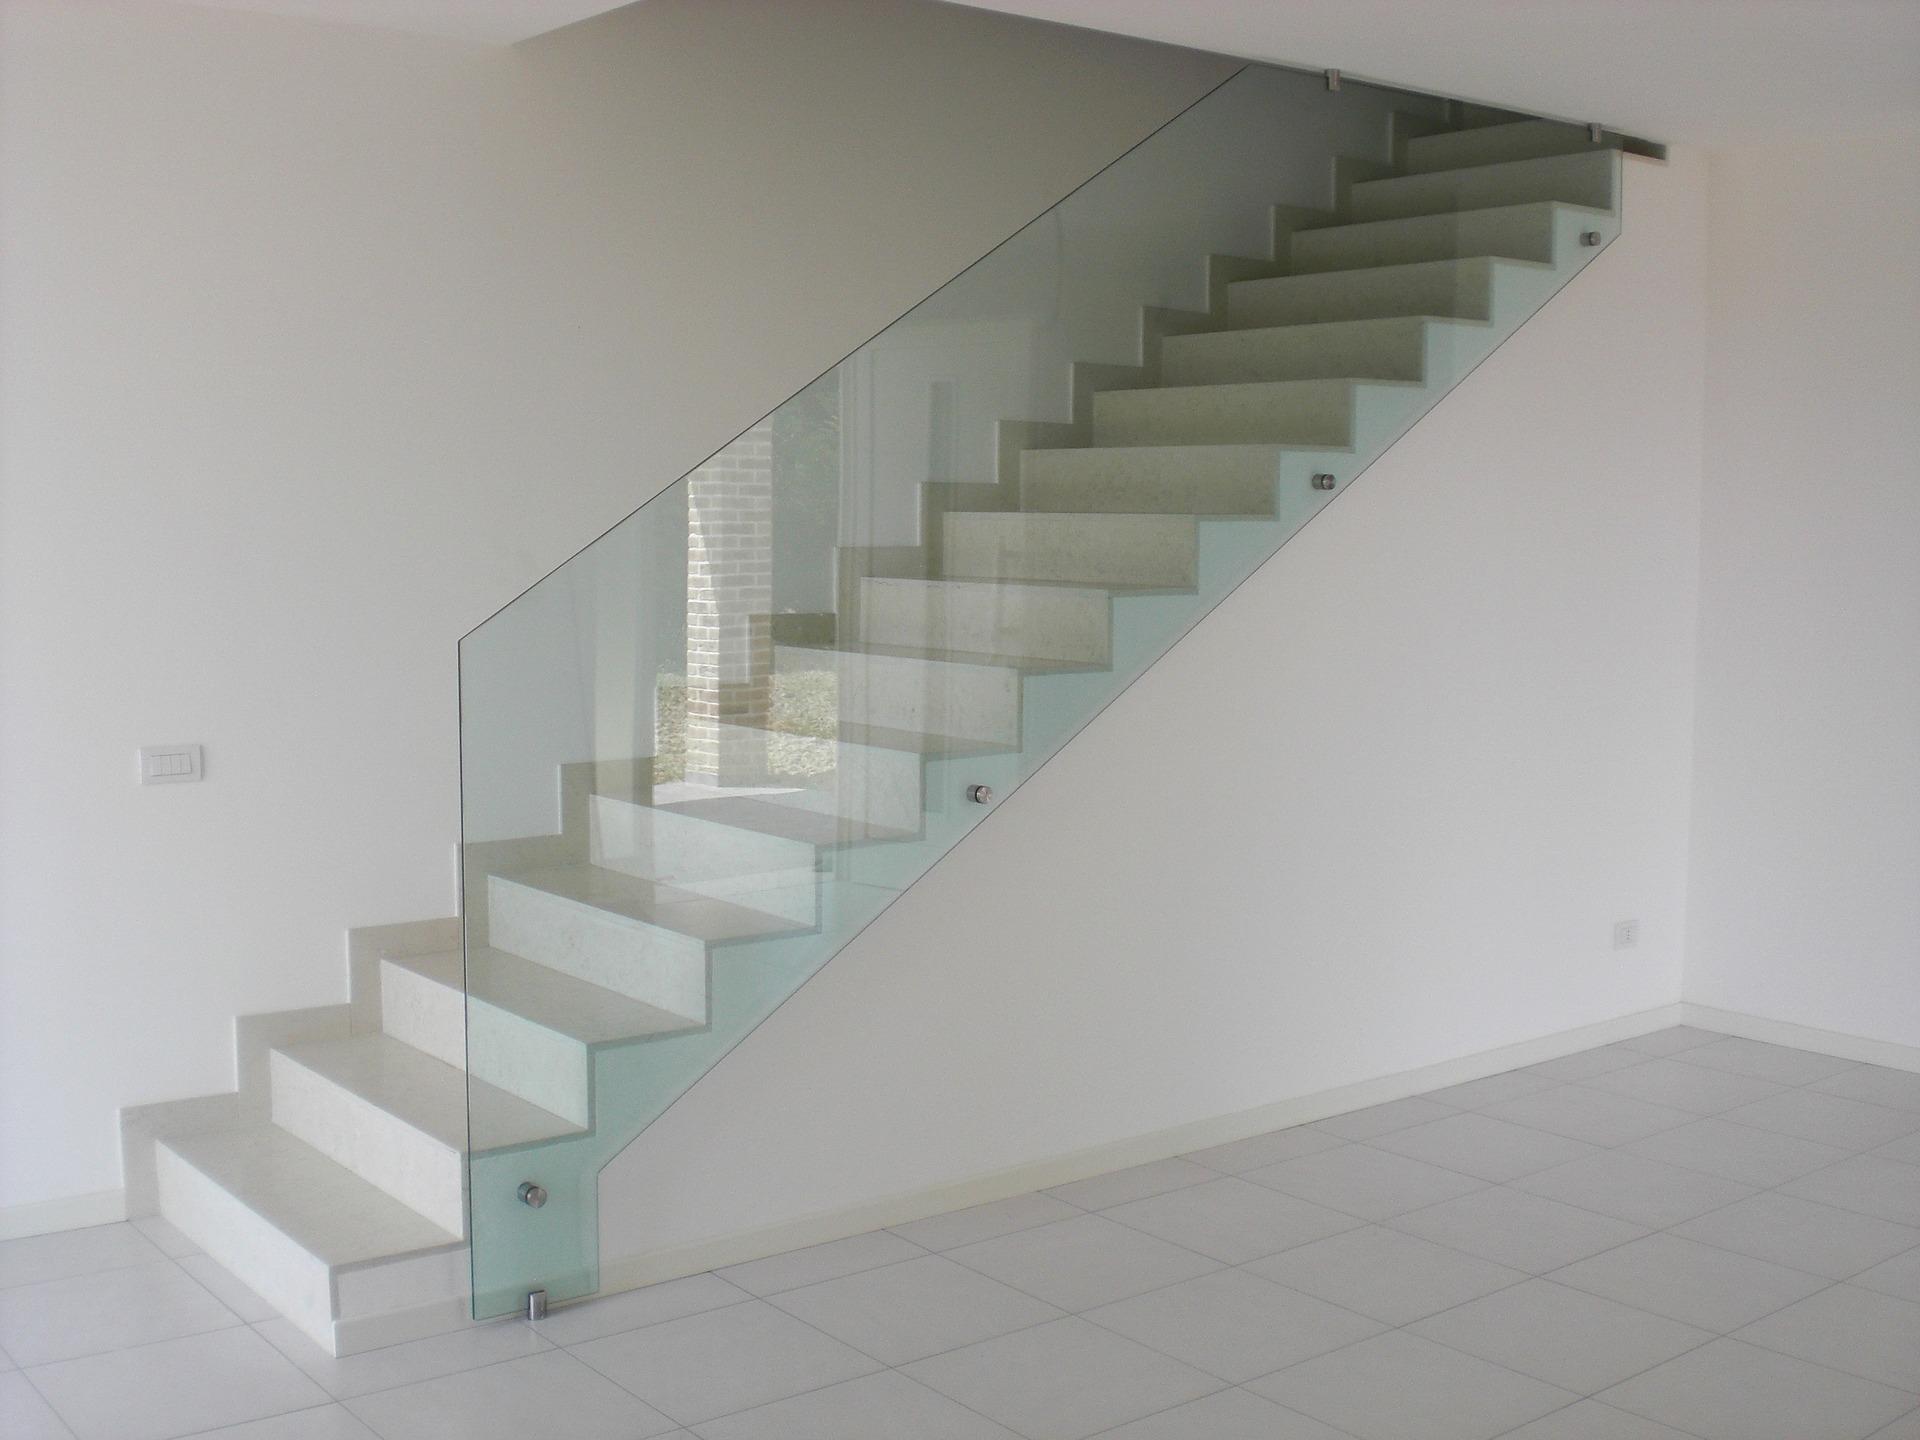 glass-wall-2134798_1920